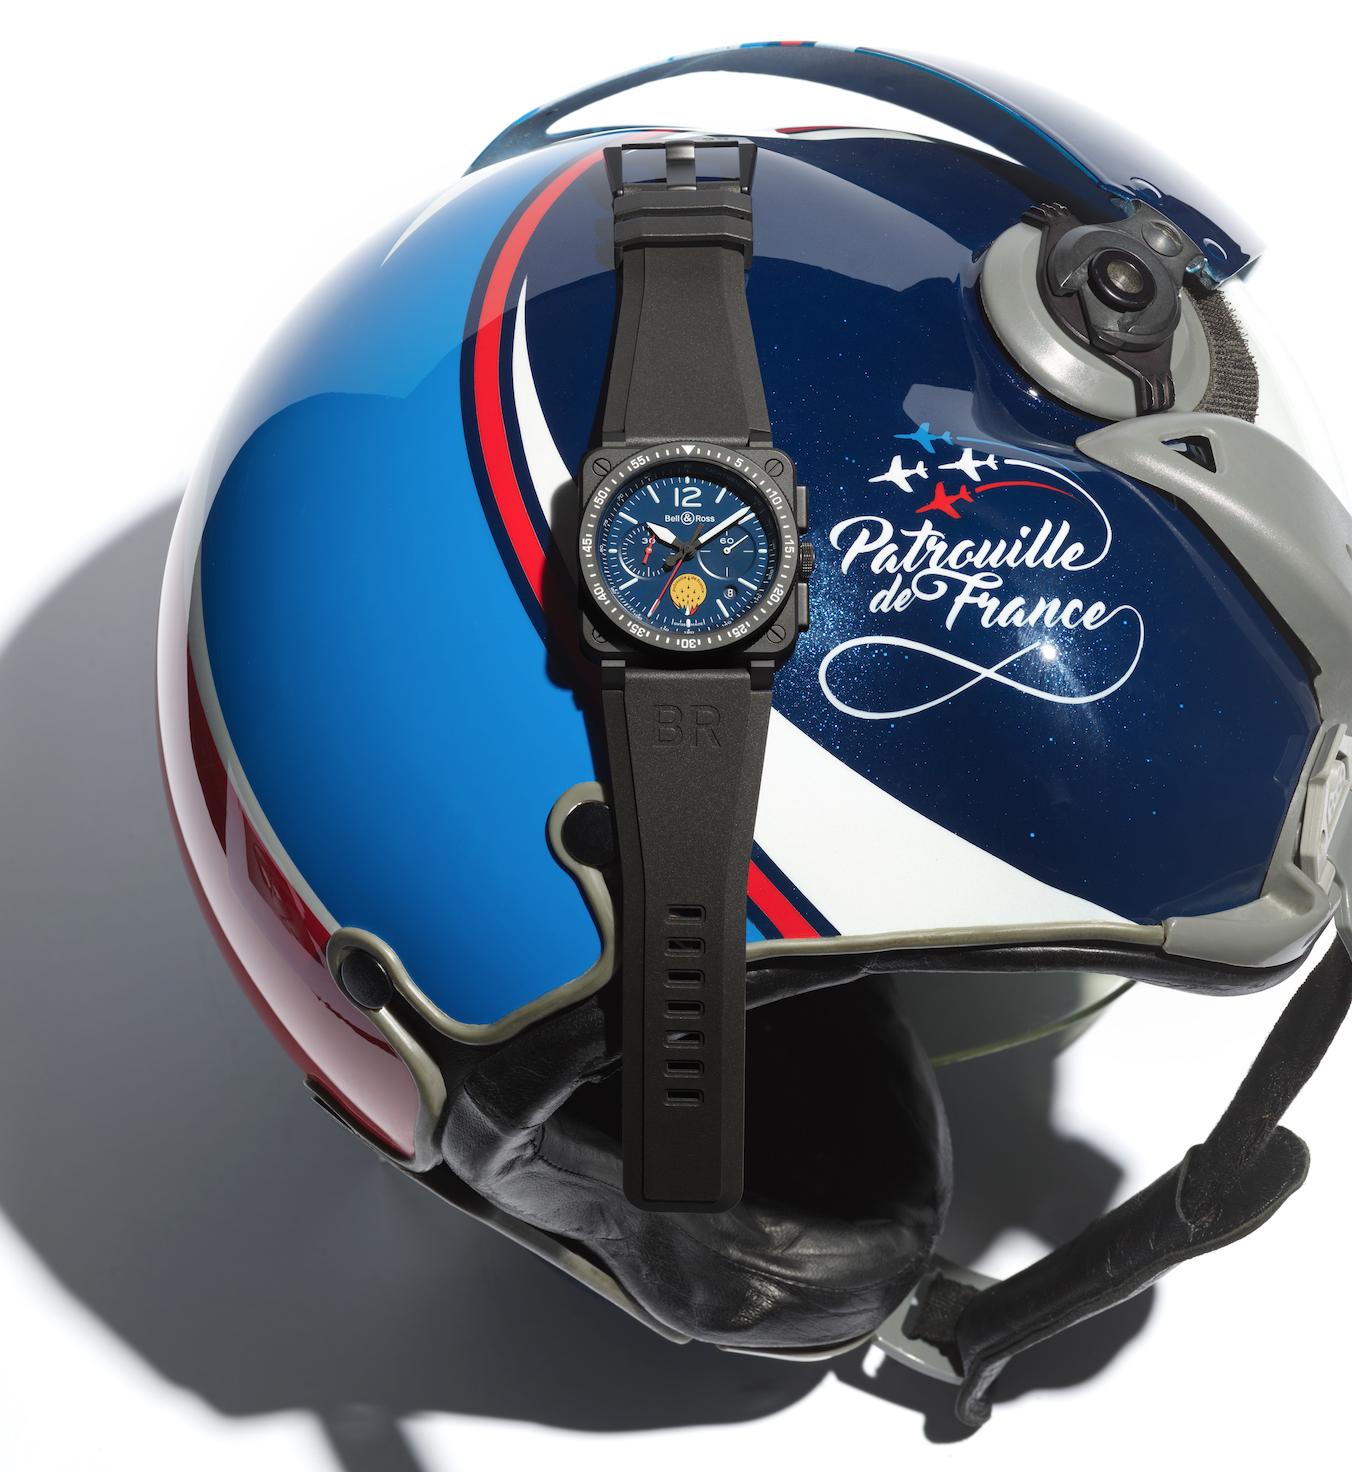 Bell & Ross BR-03-94-PATROUILLE-DE-FRANCE